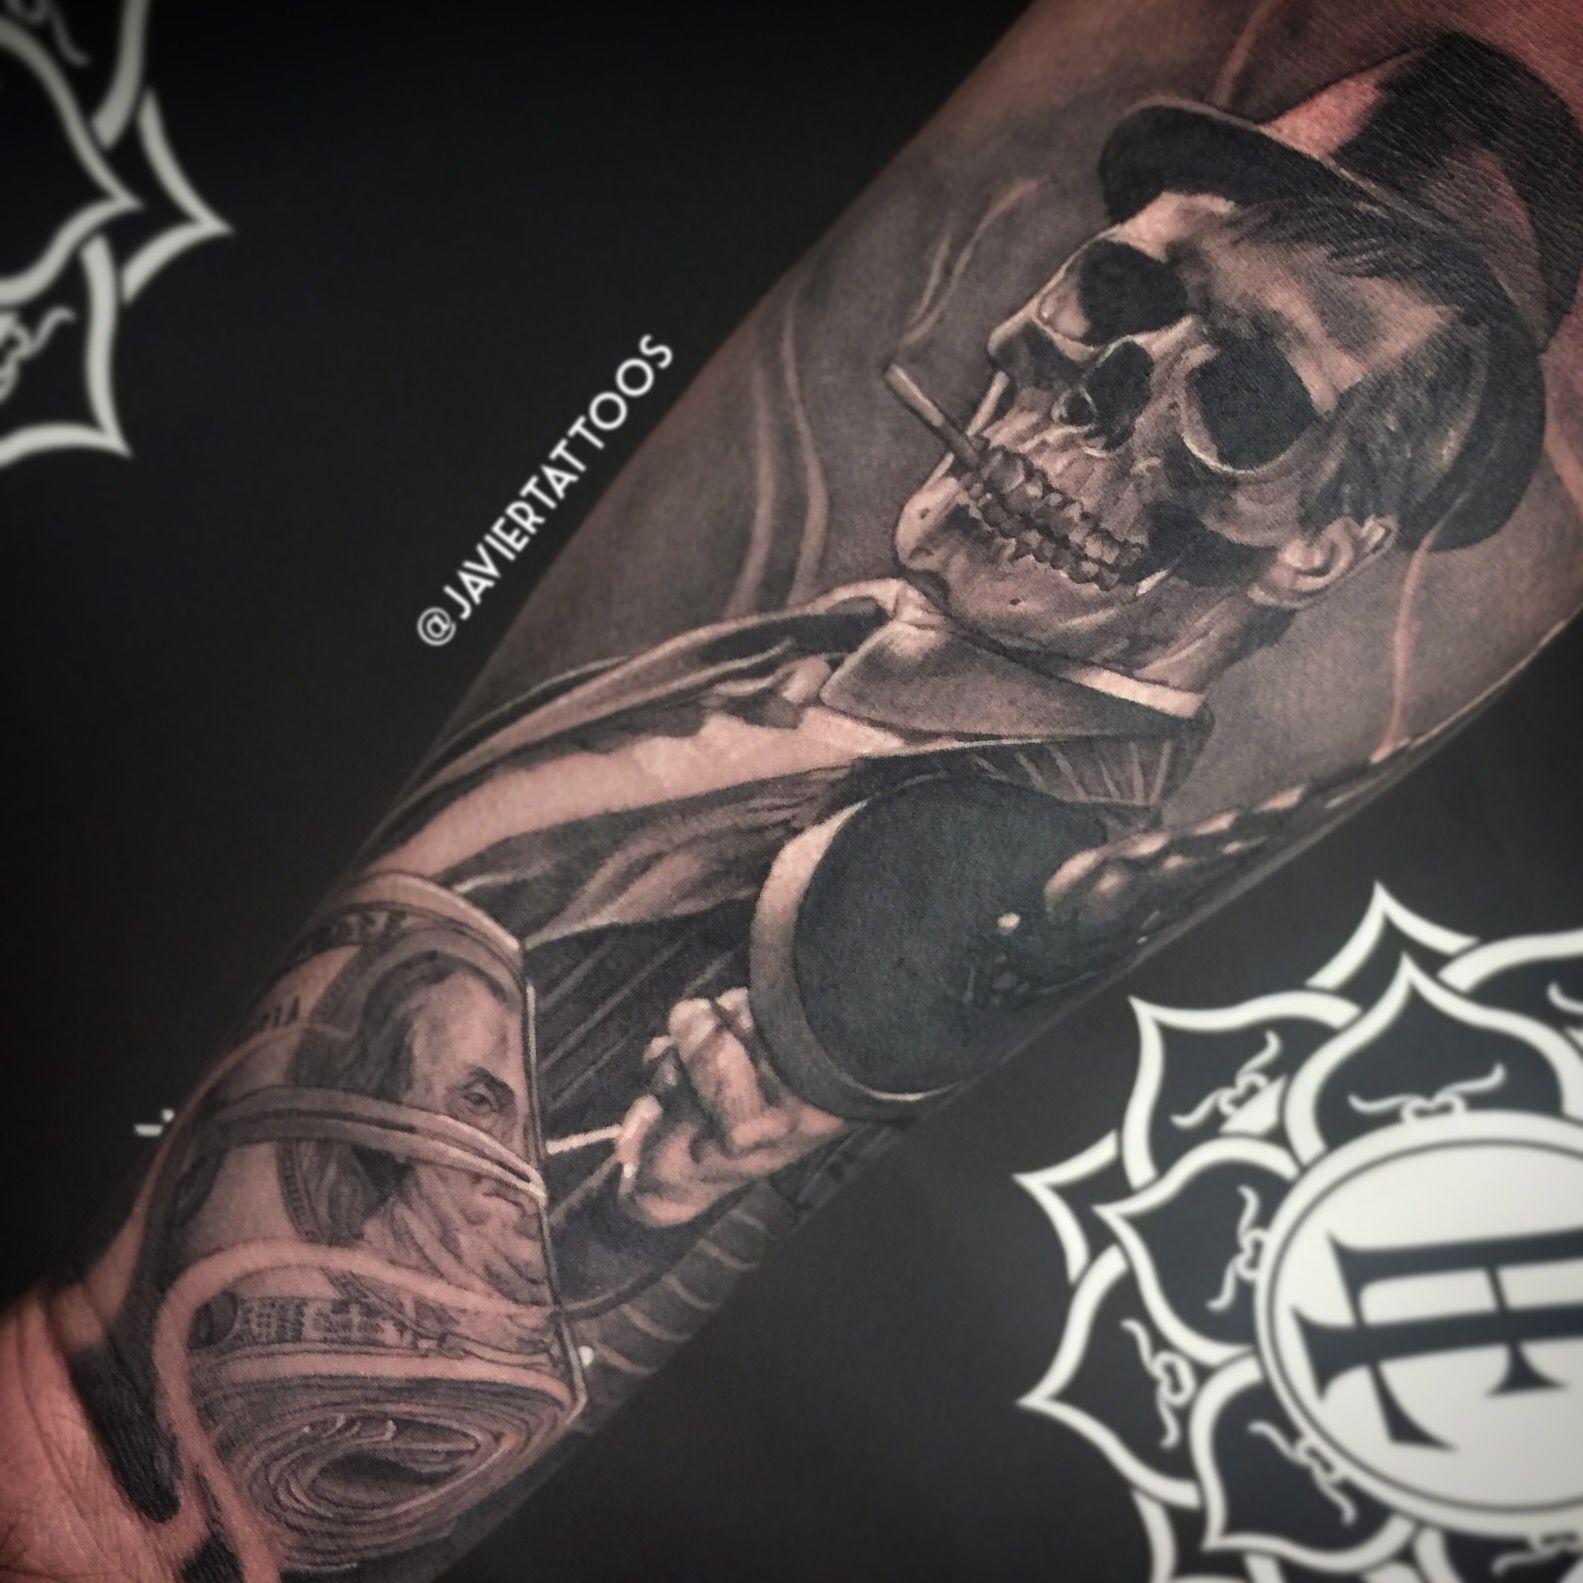 Tattoo Quotes Mafia: Custom Mafia Tattoo